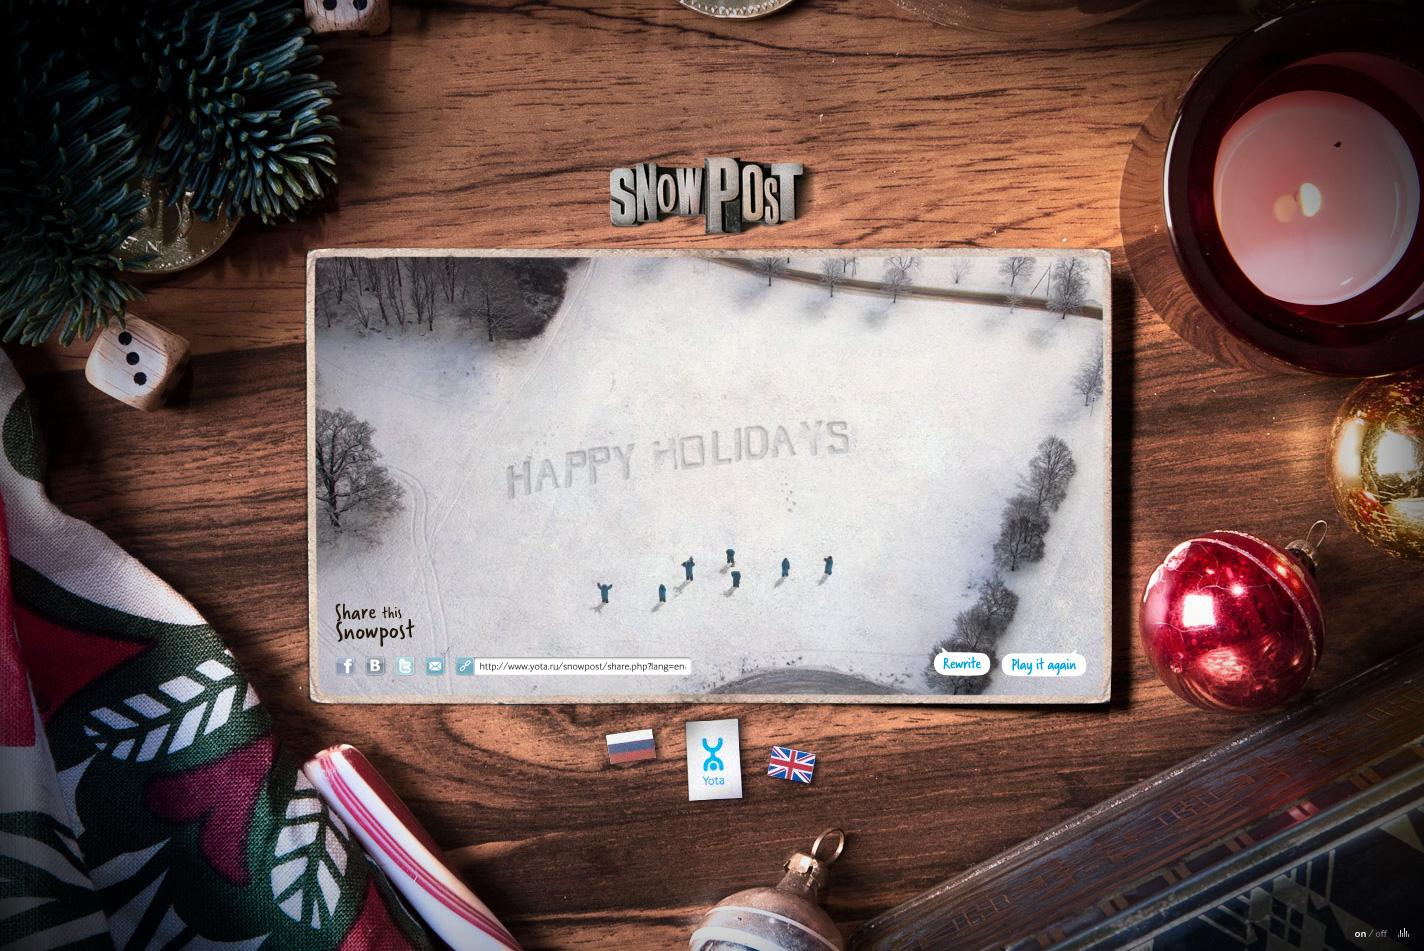 Yota Digital Ad -  Bring the winter back